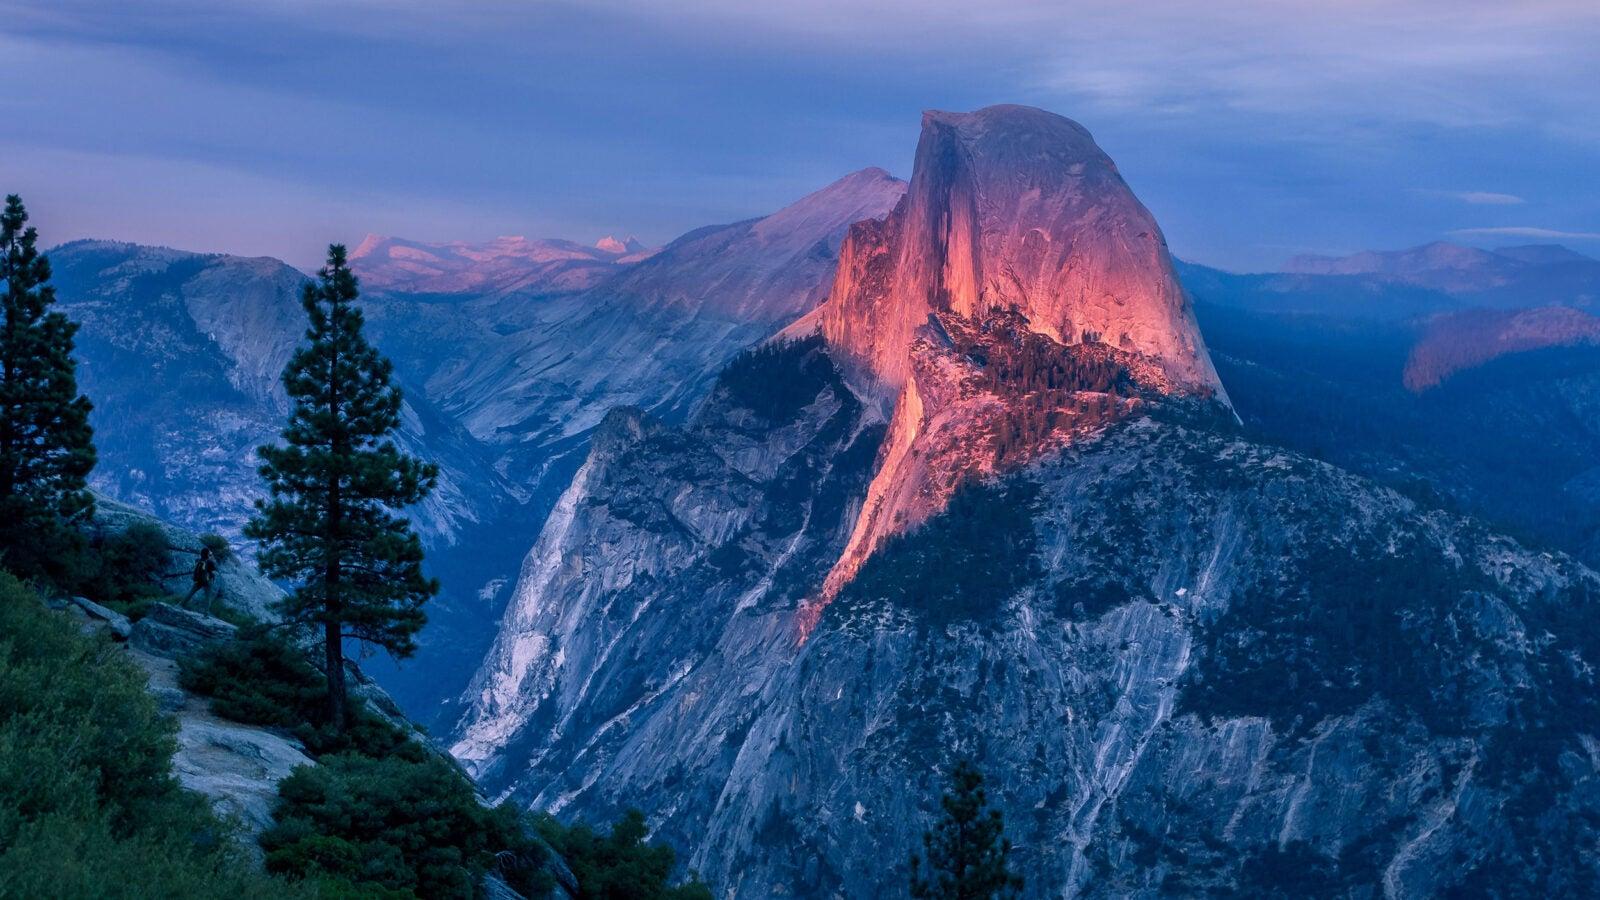 Glacier Point at Yosemite National Park.